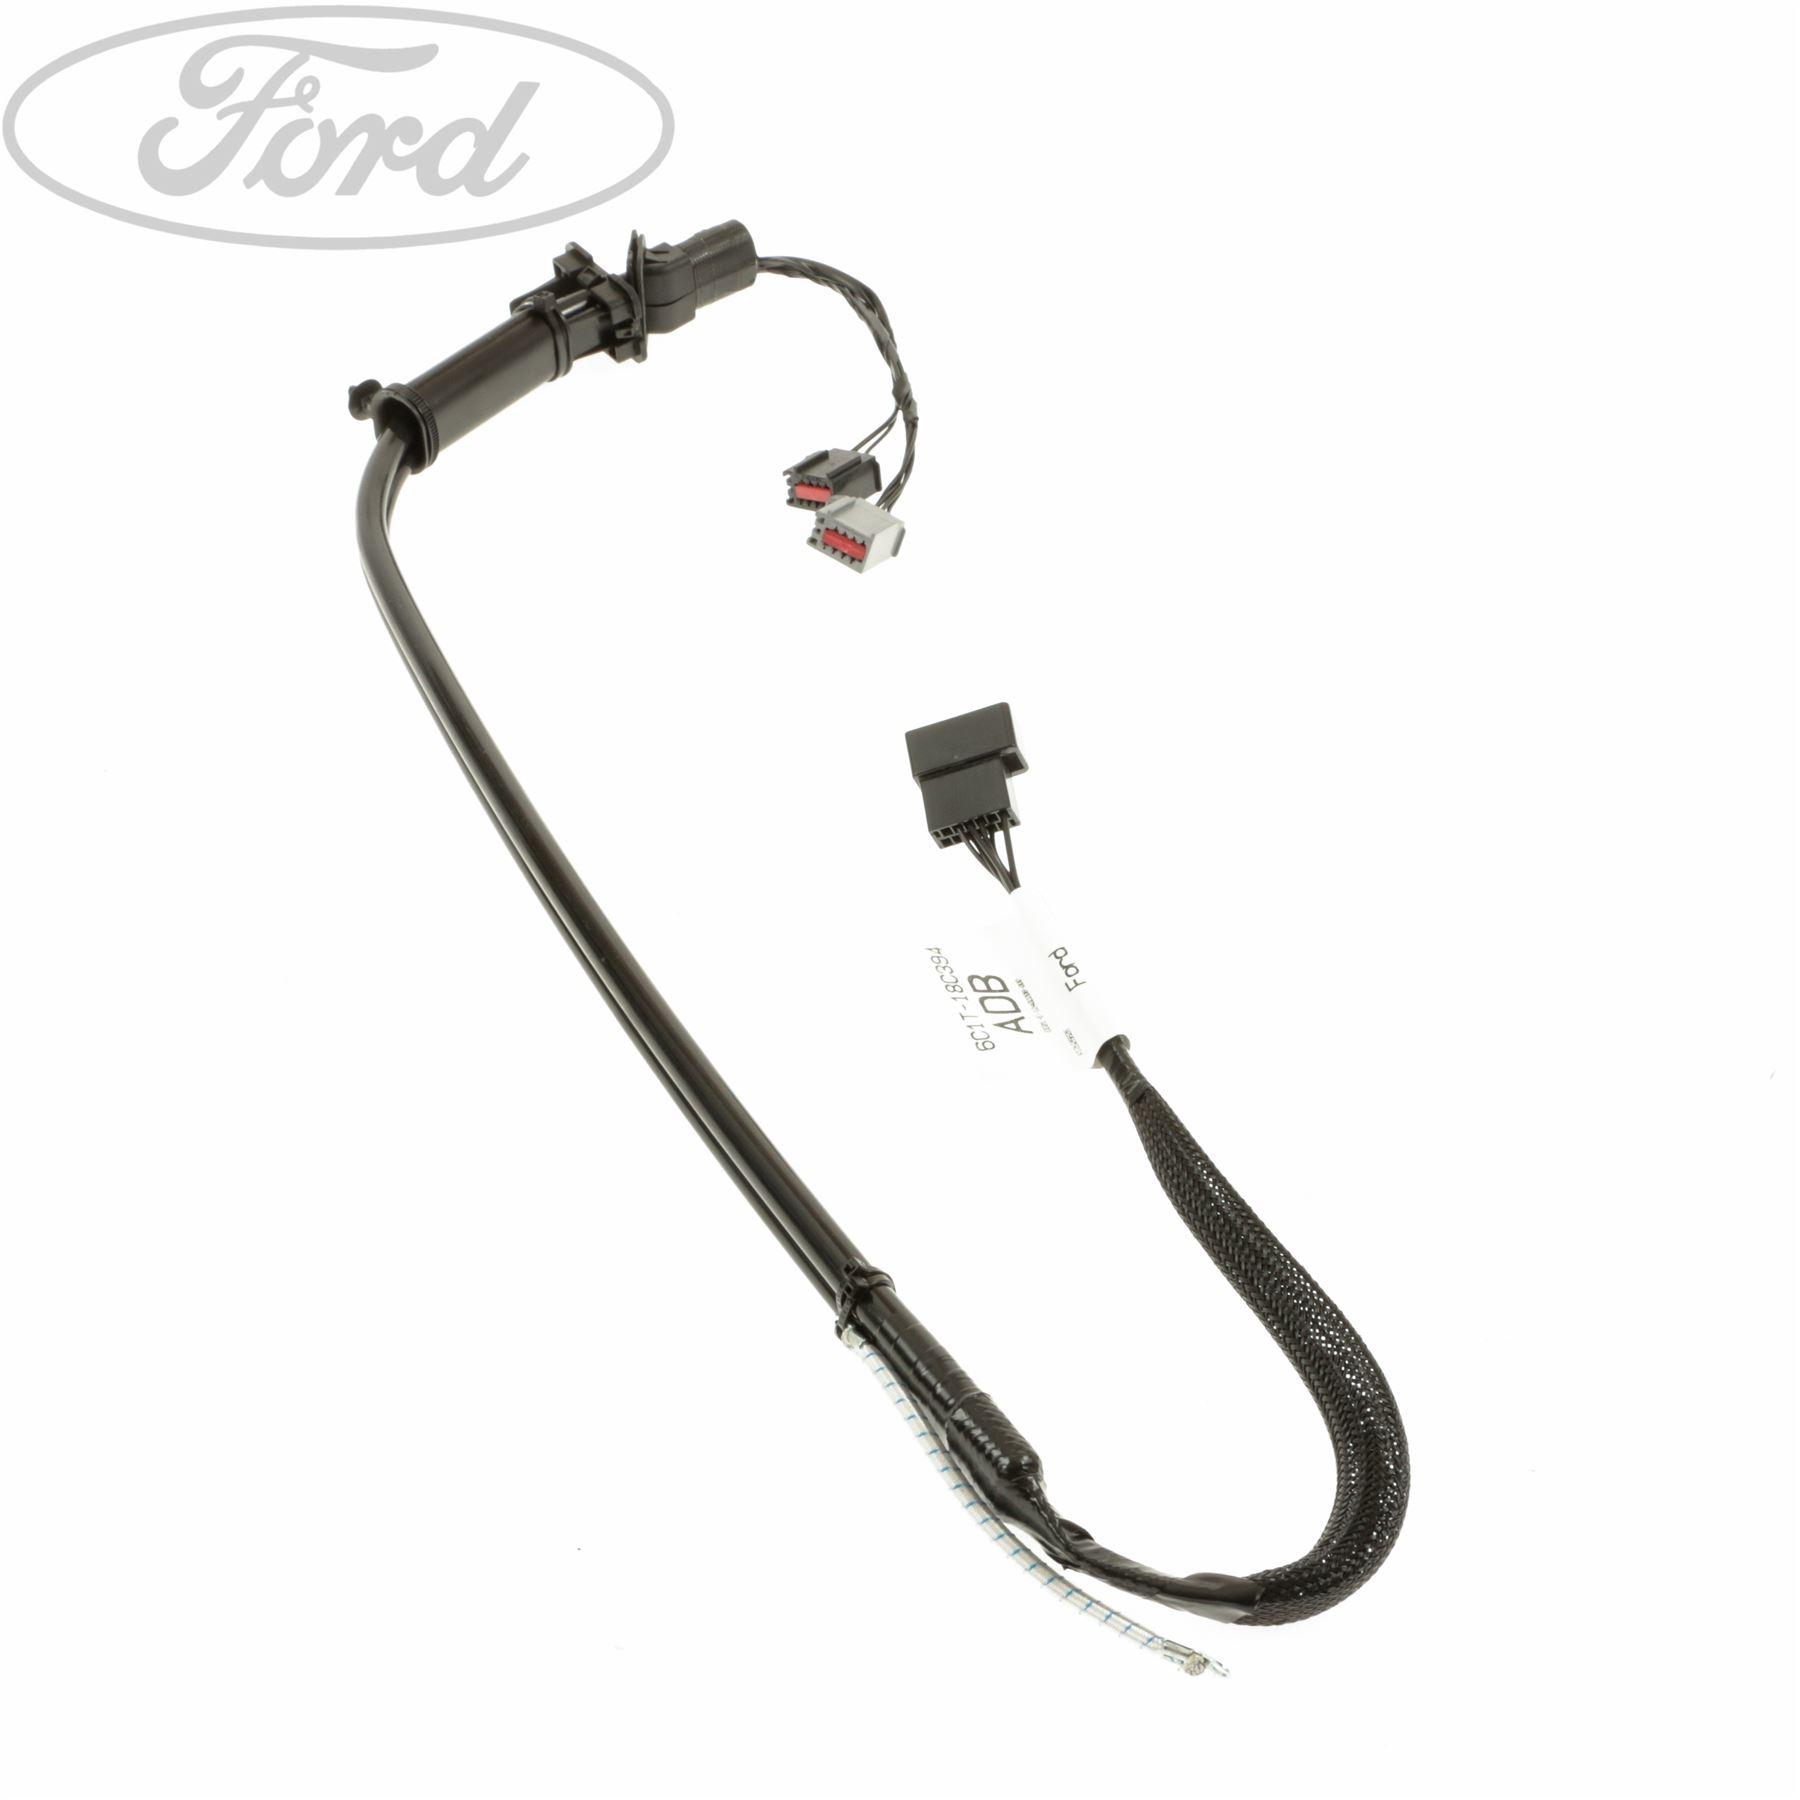 Genuine Ford Transit MK7 Instrument Panel Rear Lamps